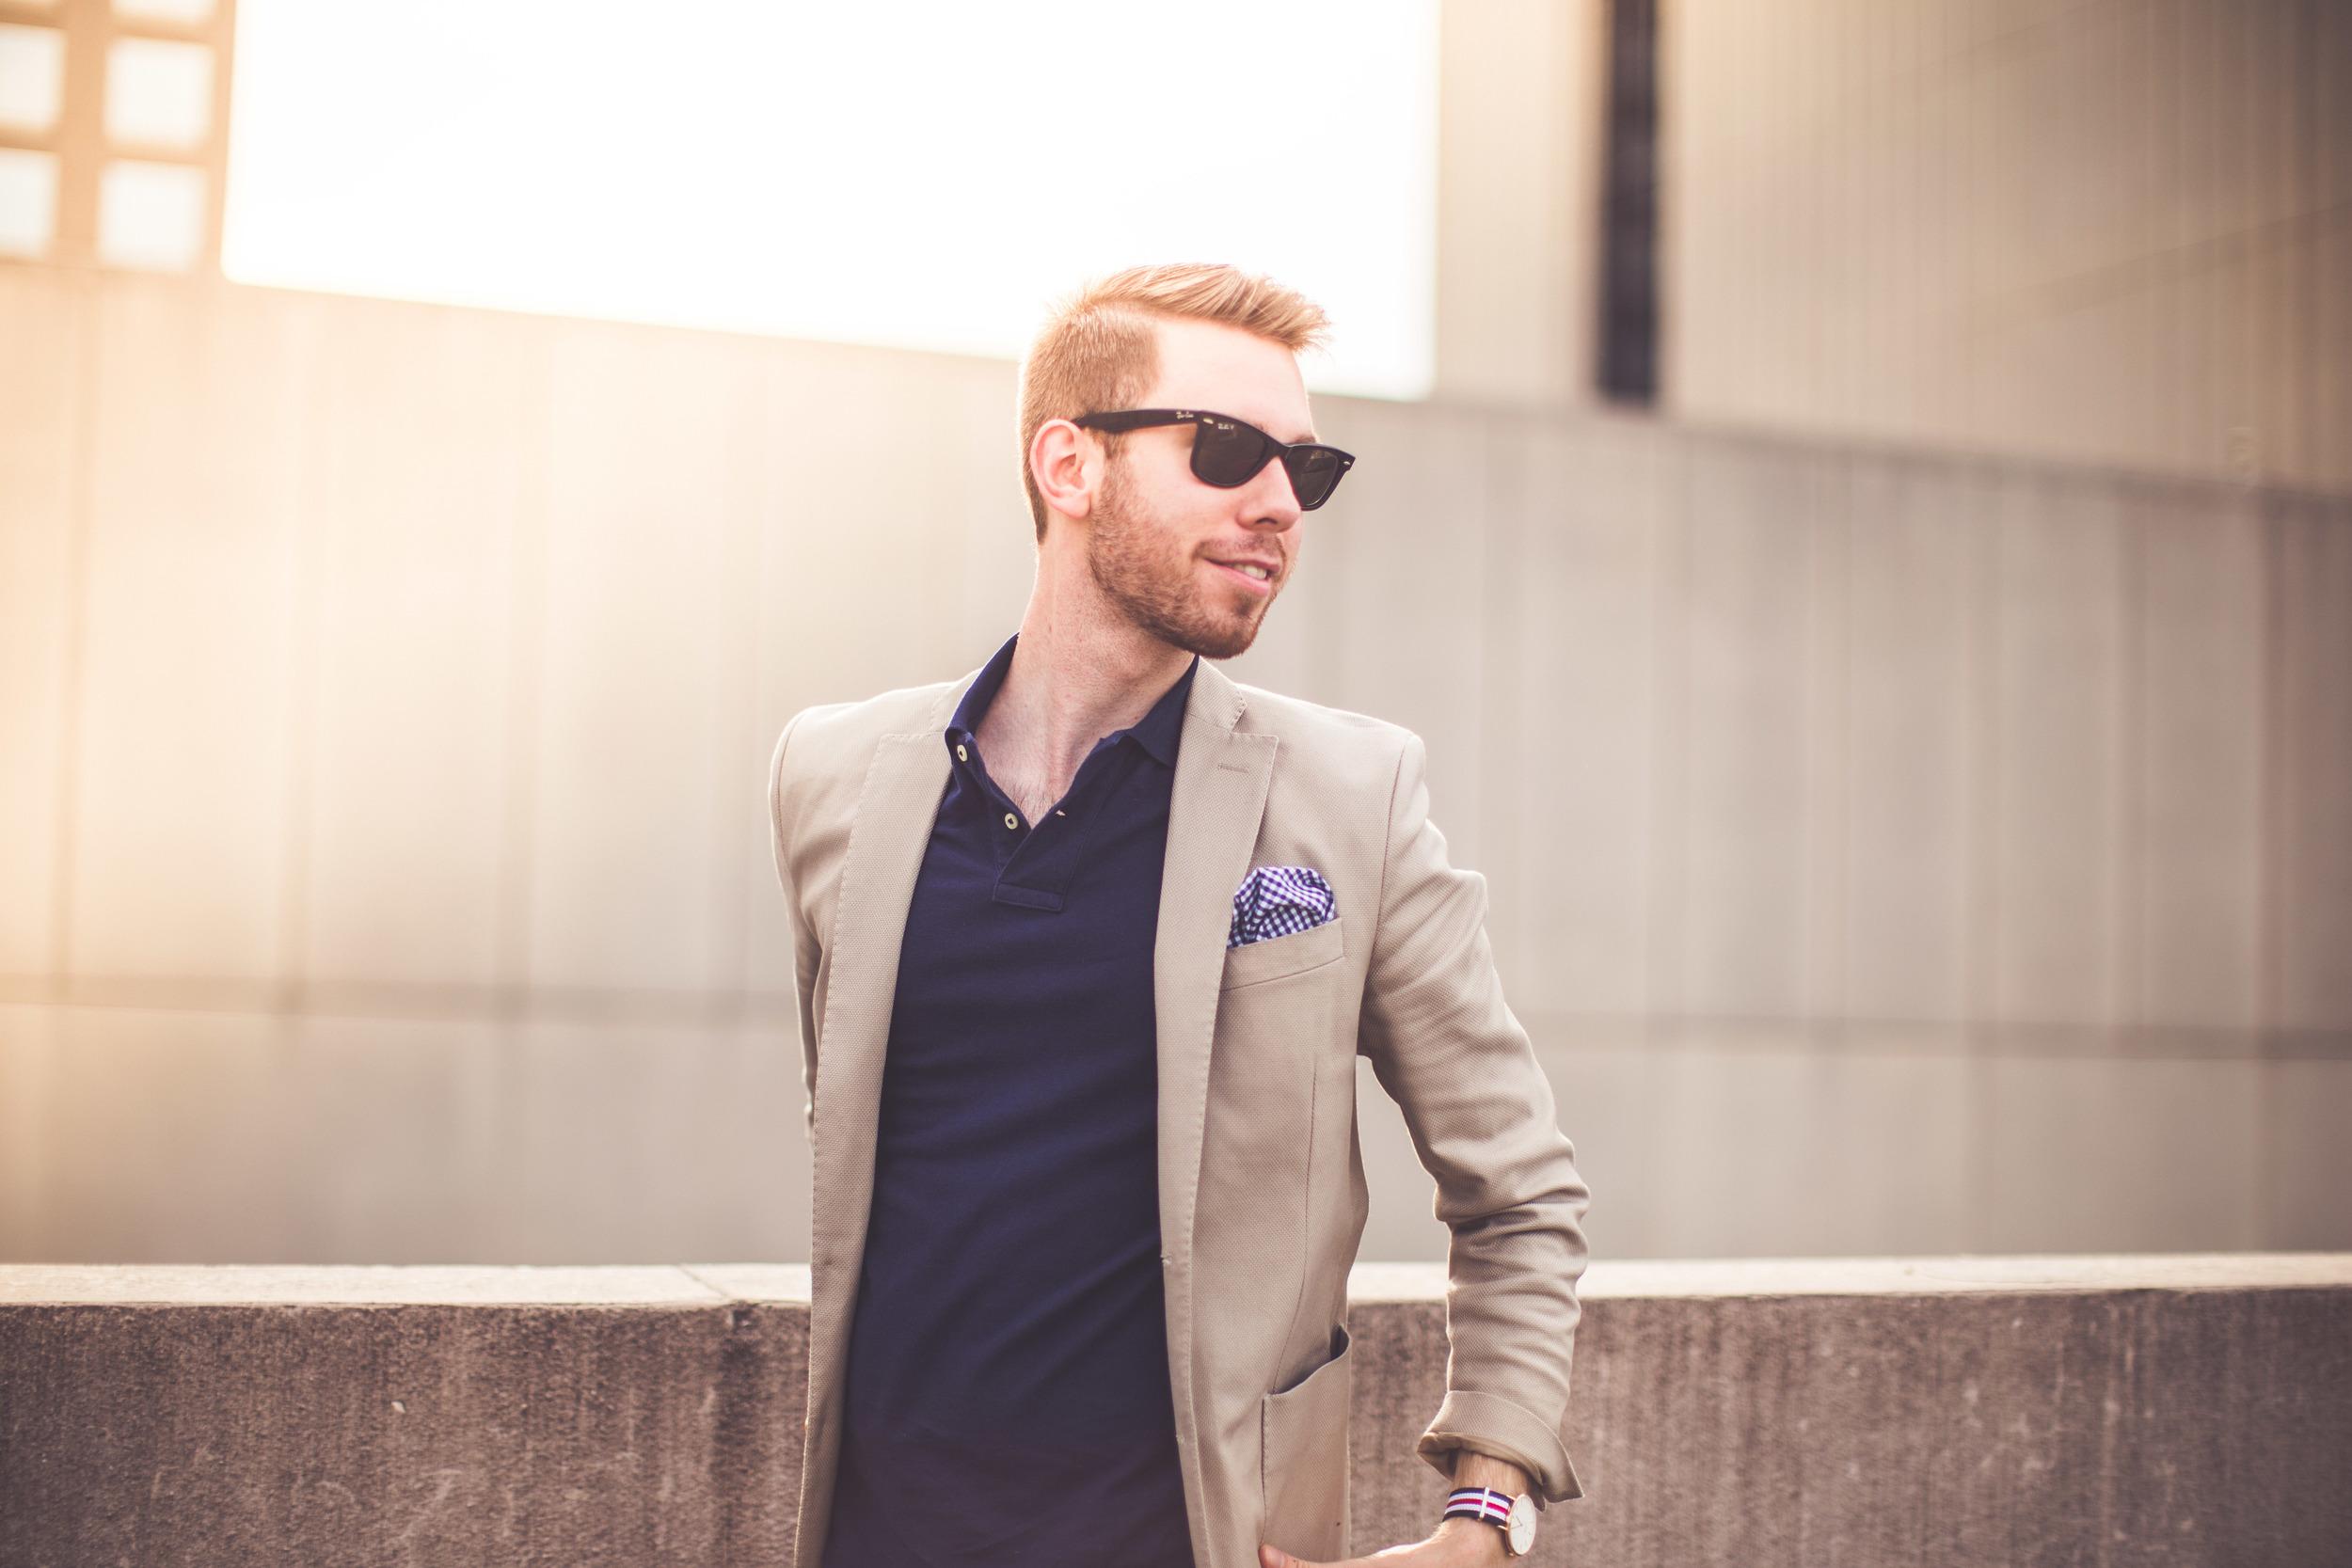 Shirt: Ralph Lauren, Blazer: J. Lindeberg, Pocket Square: J Crew, Sunglasses: Ray-Ban, Watch: Daniel Wellington